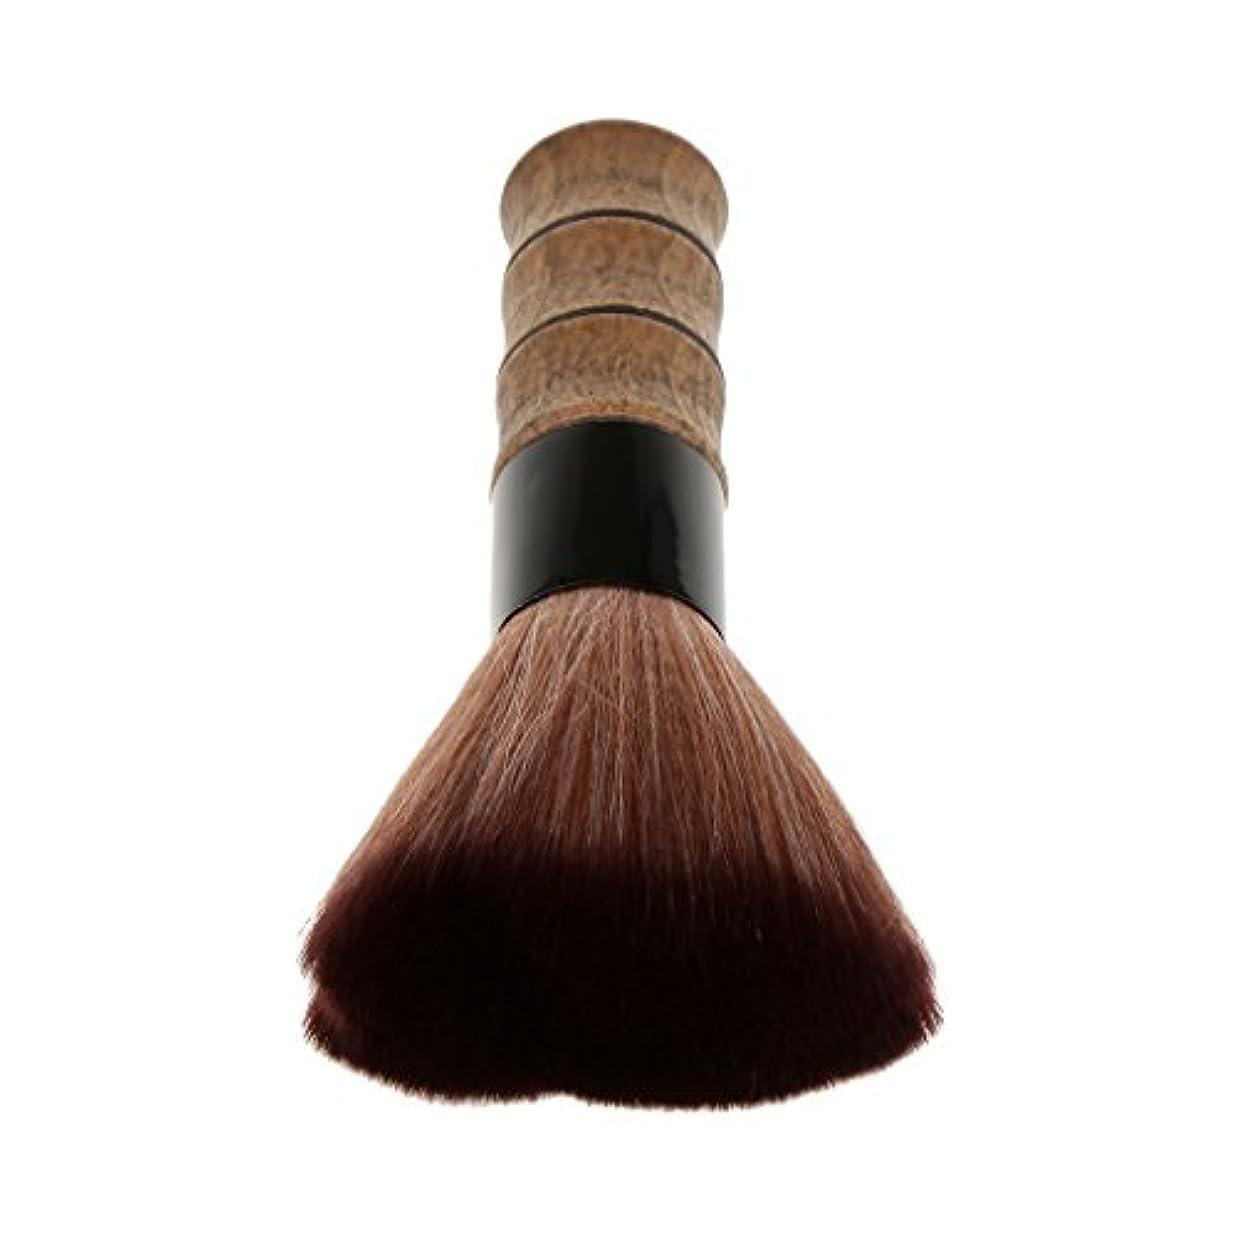 Fenteer シェービングブラシ ソフトファイバー 脱毛 シェービング ブラシ ブラッシュ ルーズパウダー メイクブラシ 繊維+竹ハンドル 2色選べる - 褐色